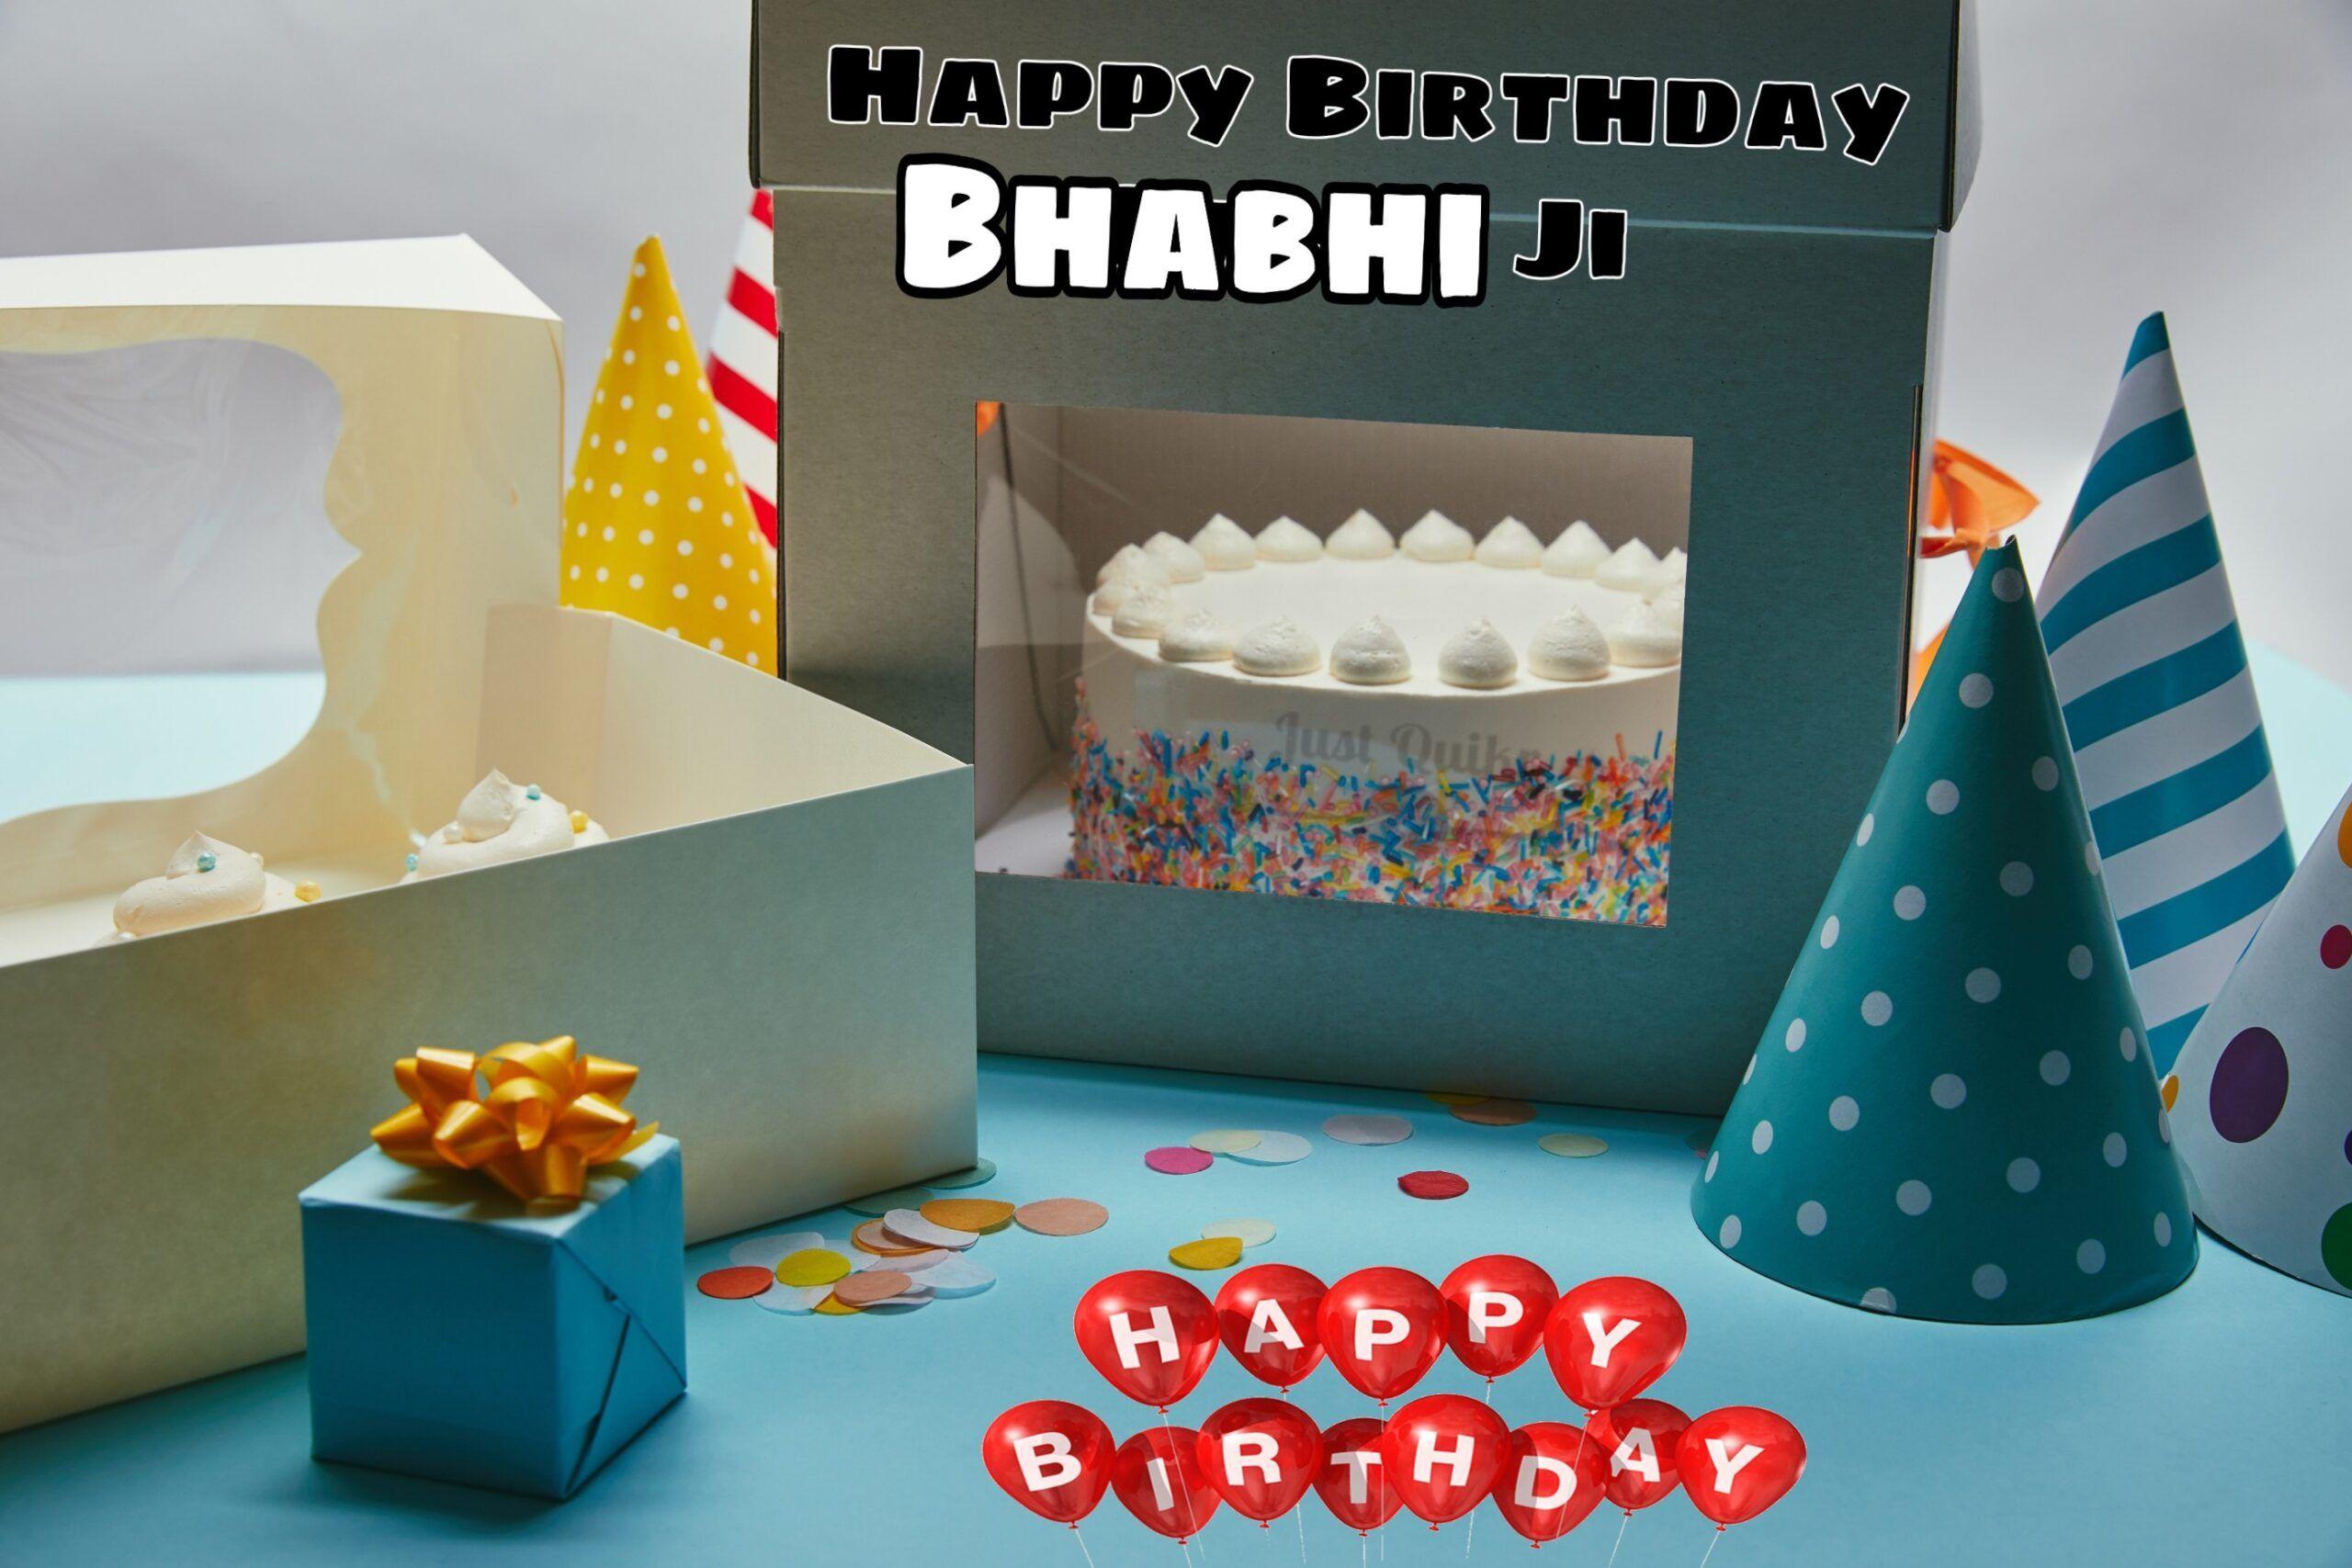 Top 10 Special Unique Happy Birthday Cake Hd Pics Images For Bhabhi Ji J U S T Q U Happy Birthday Cake Hd Happy Birthday Cakes Happy Birthday Cake Pictures